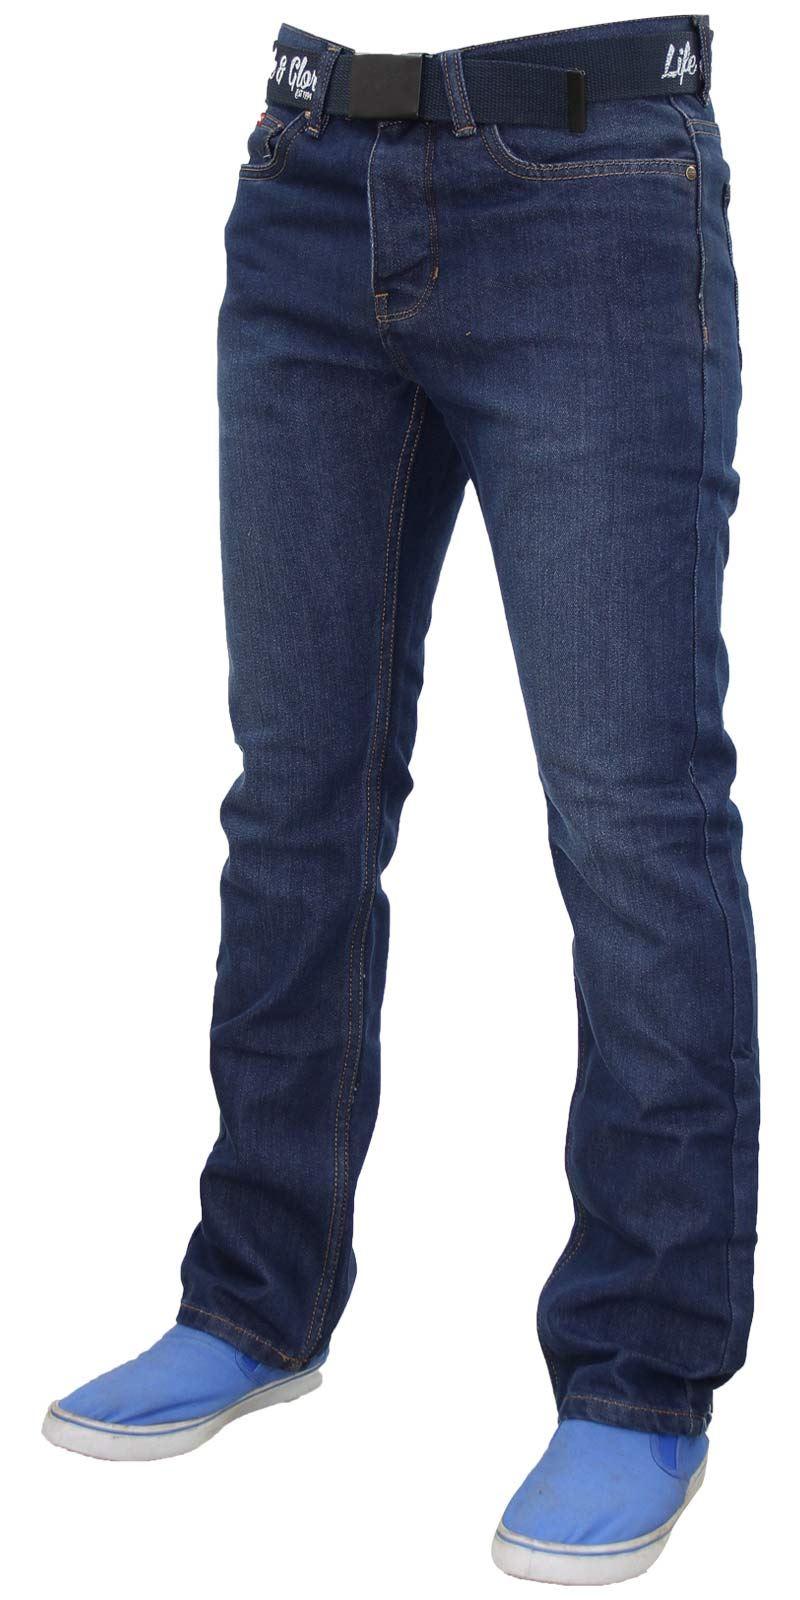 Men-Regular-Fit-Jeans-Denim-Button-Fly-Straight-Leg-Trouser-Pant-With-Free-Belt thumbnail 9